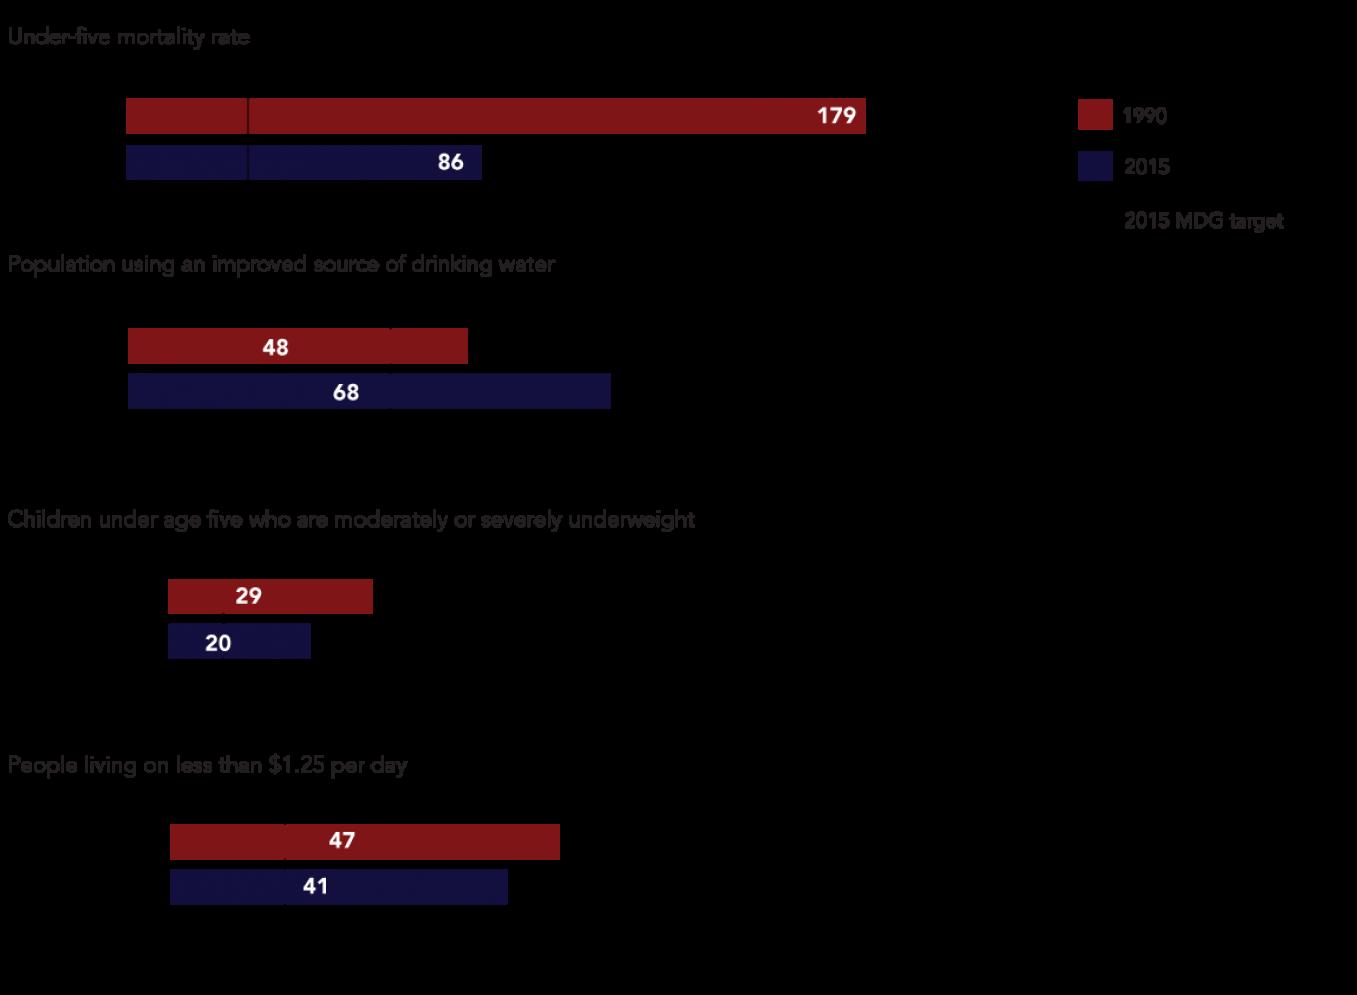 Select Development Indicators for Sub-Saharan Africa, 1990 vs 2015 (%)